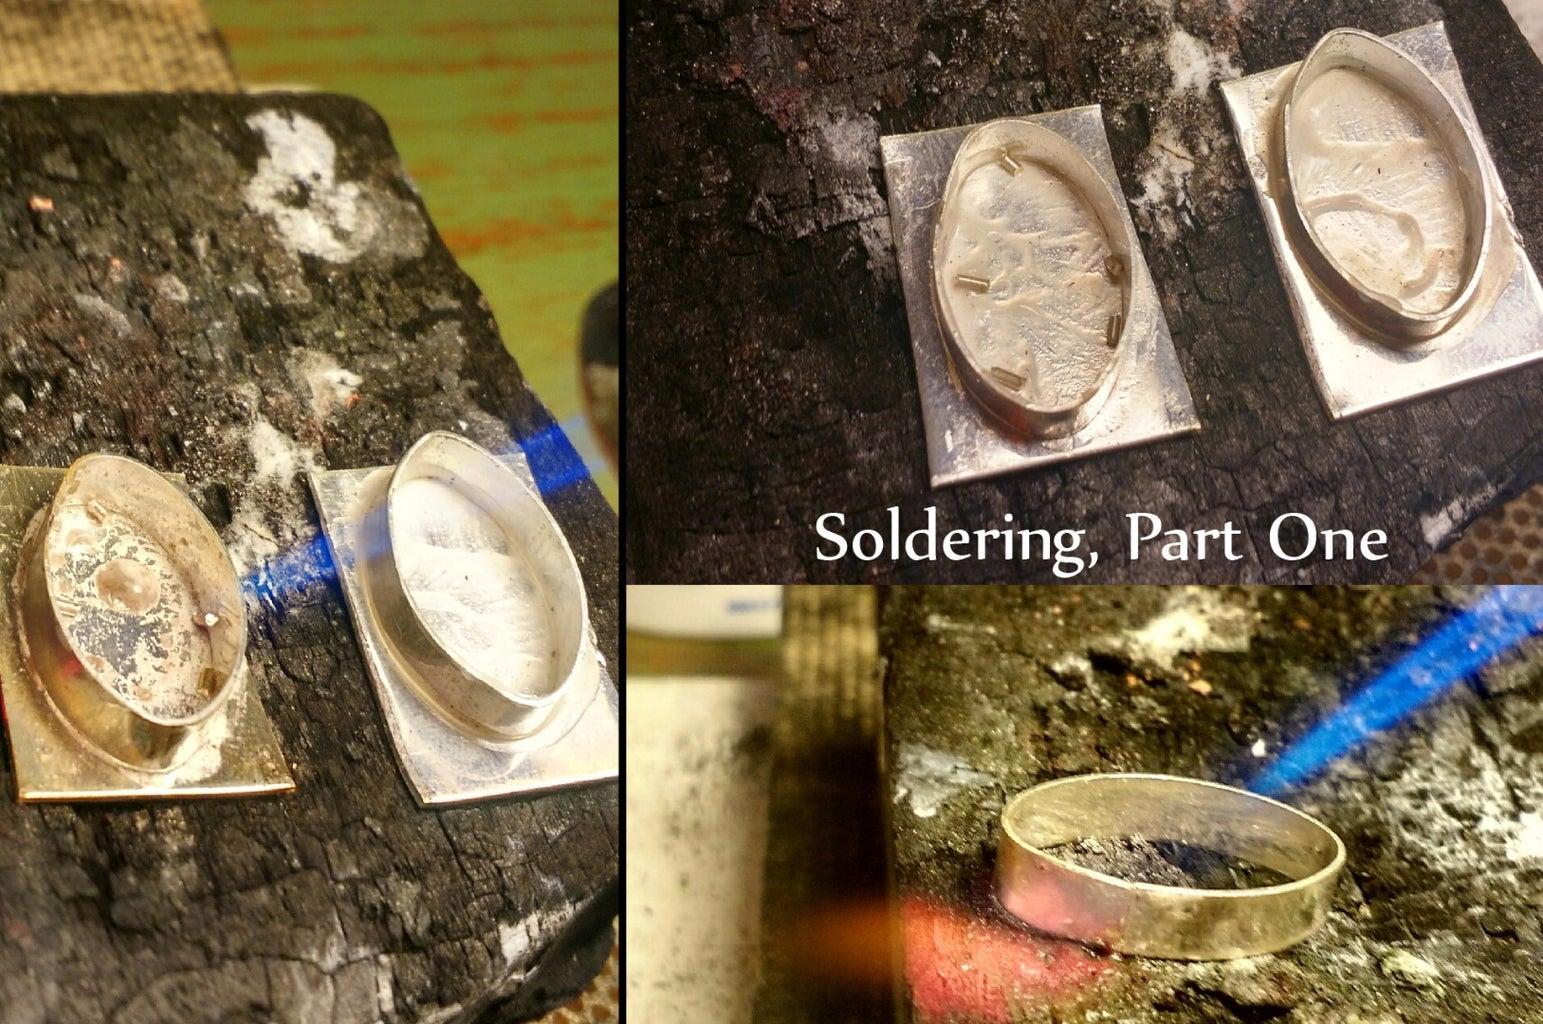 Soldering: Part One